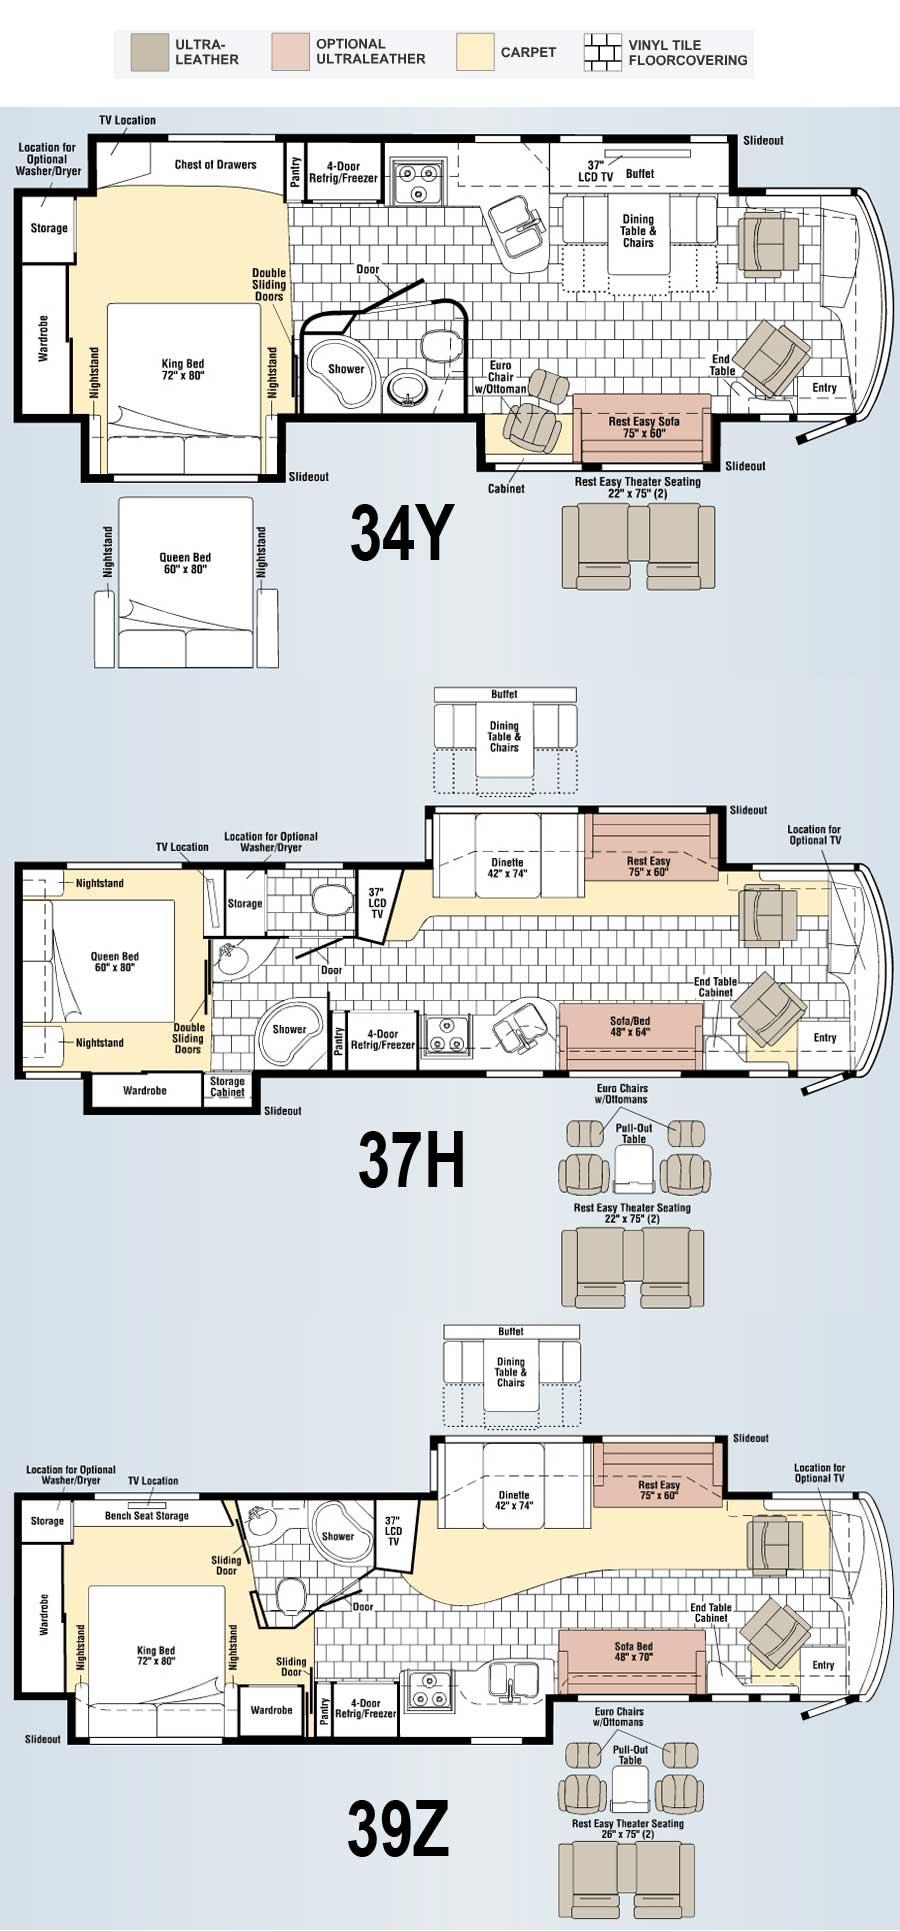 Winnebago Journey class A motorhome floorplans - large picture